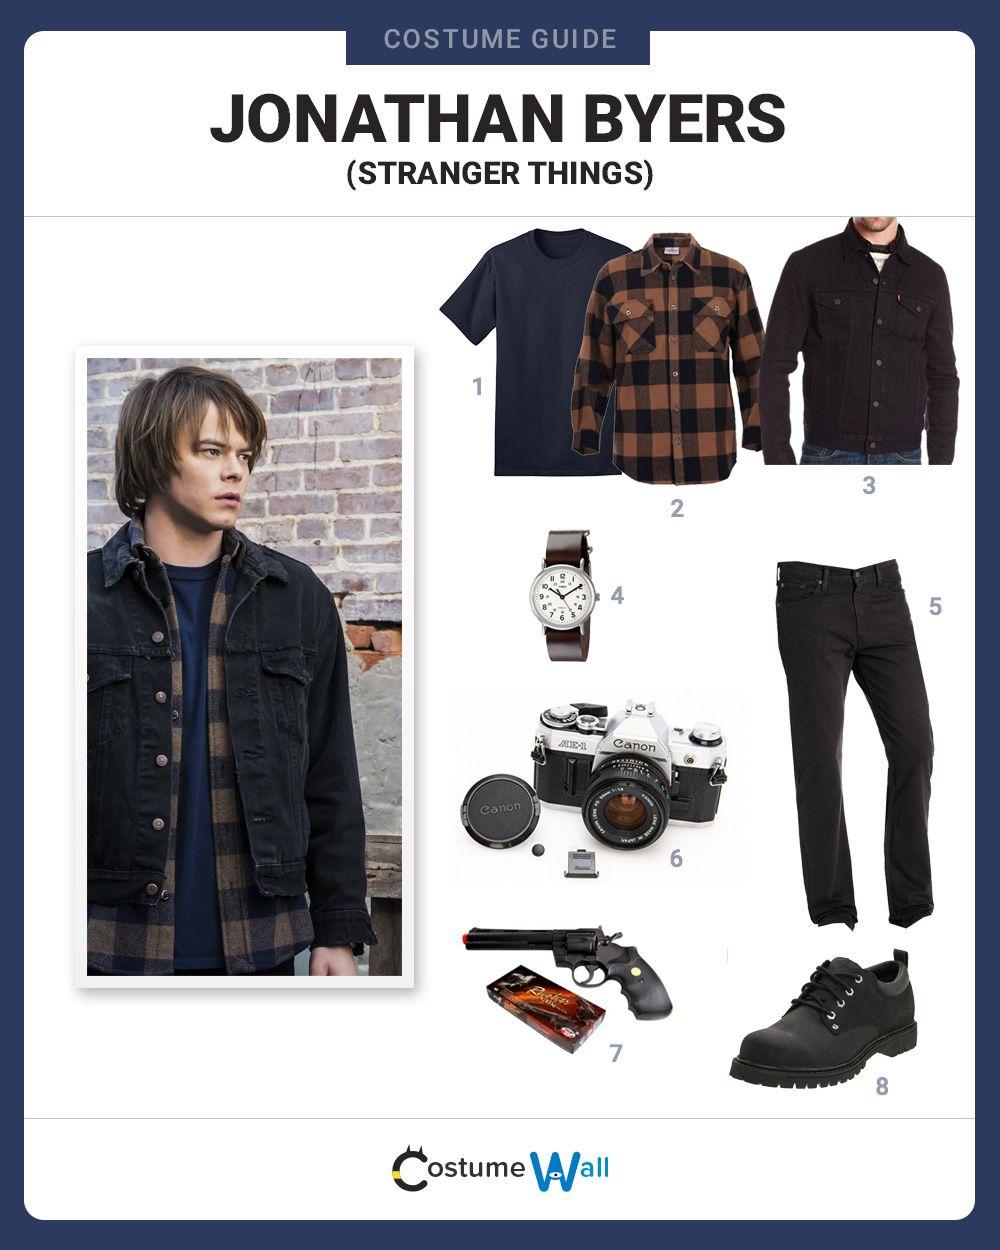 Halloween Costume Ideas Stranger Things 2020 Dress like Jonathan Byers | Costume and Cosplay Guide | Stranger